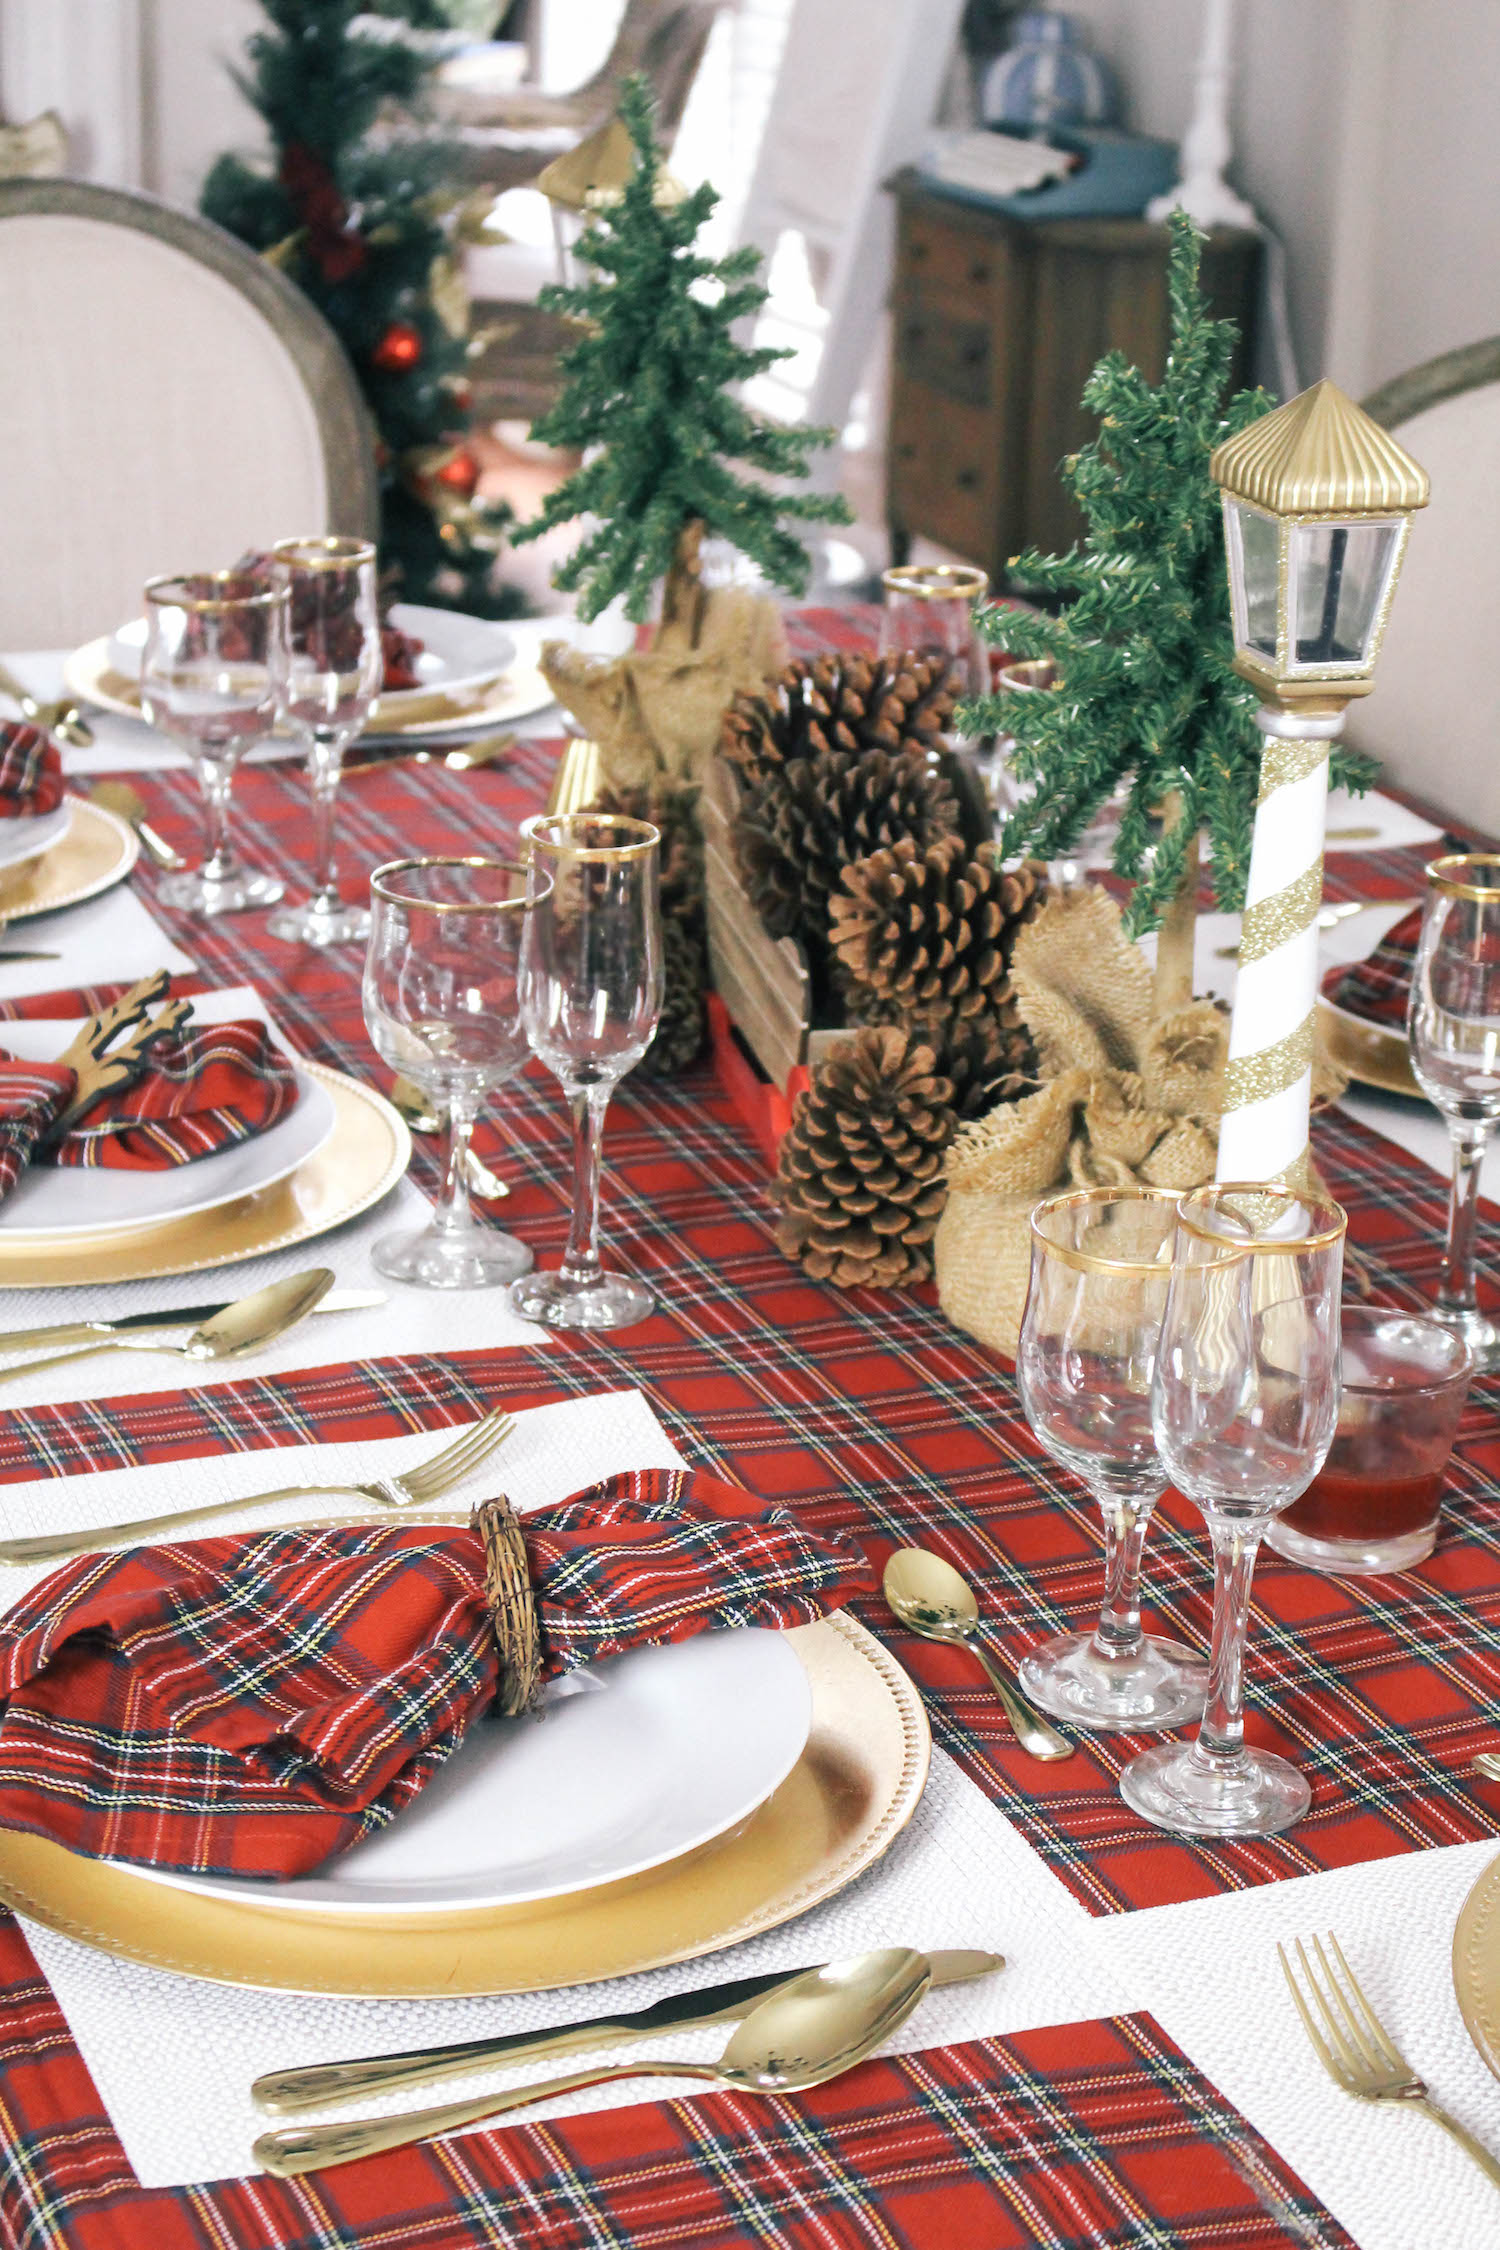 Christmas-Tablescape-Red-Plaid-Decor-11